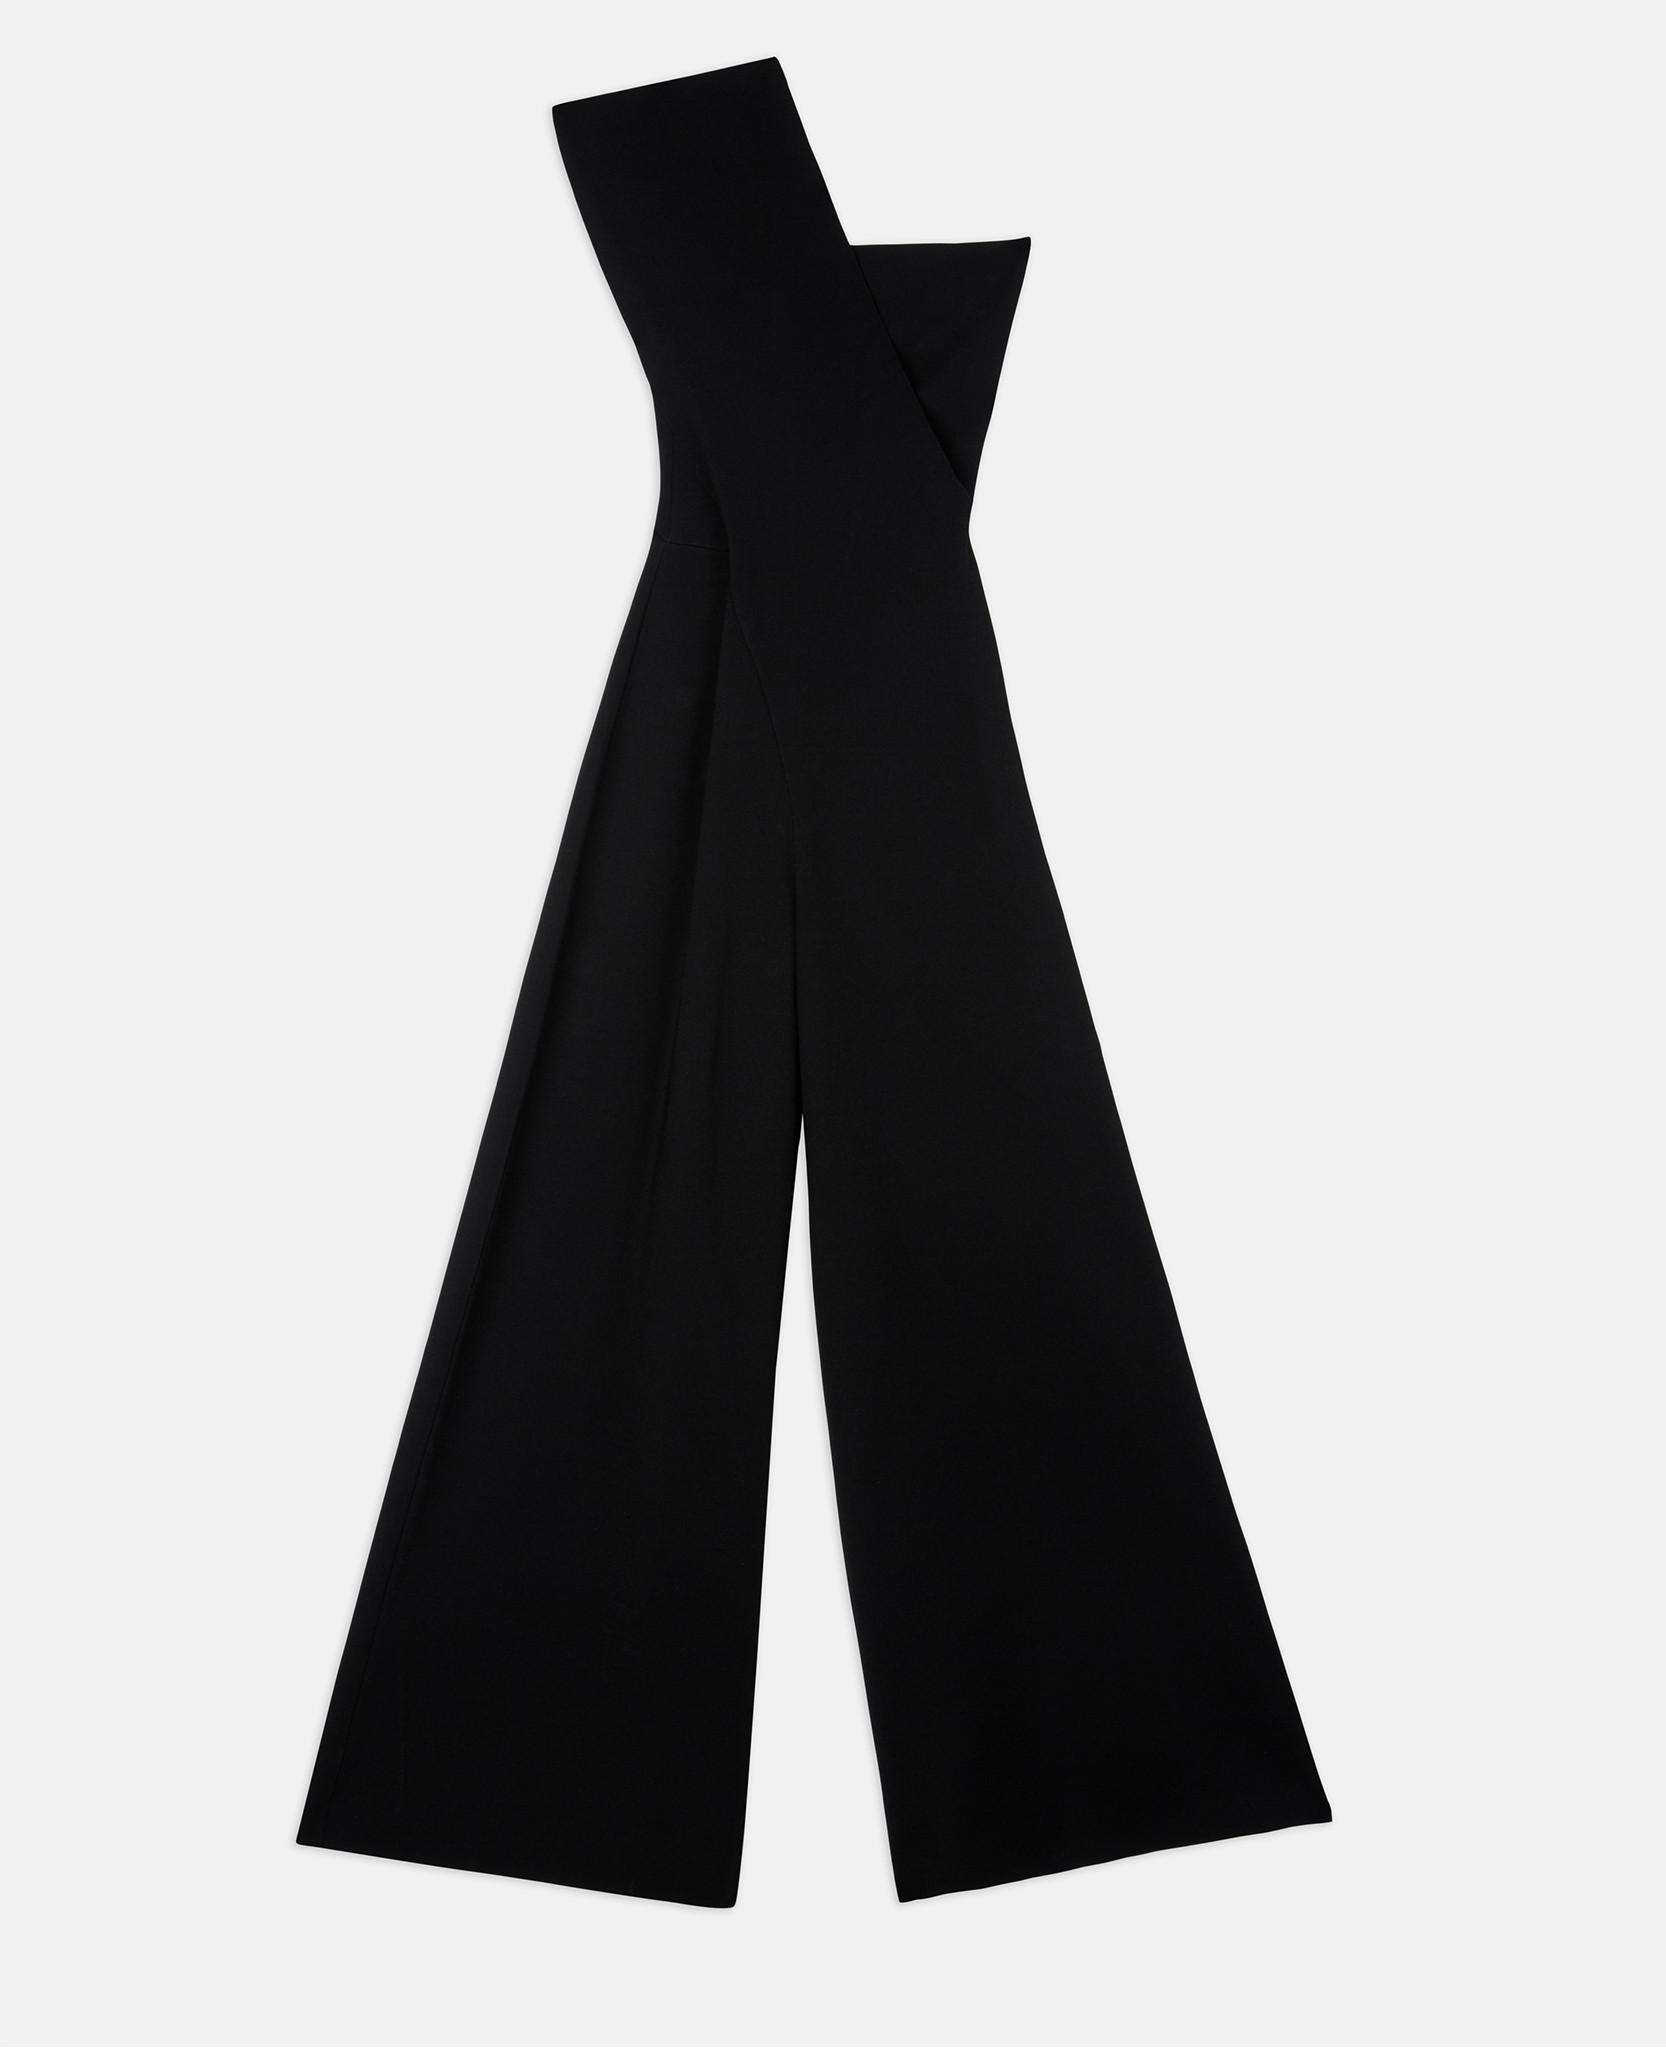 5e036d3b5642 Lyst - Stella McCartney Black Compact Knit Jumpsuit in Black